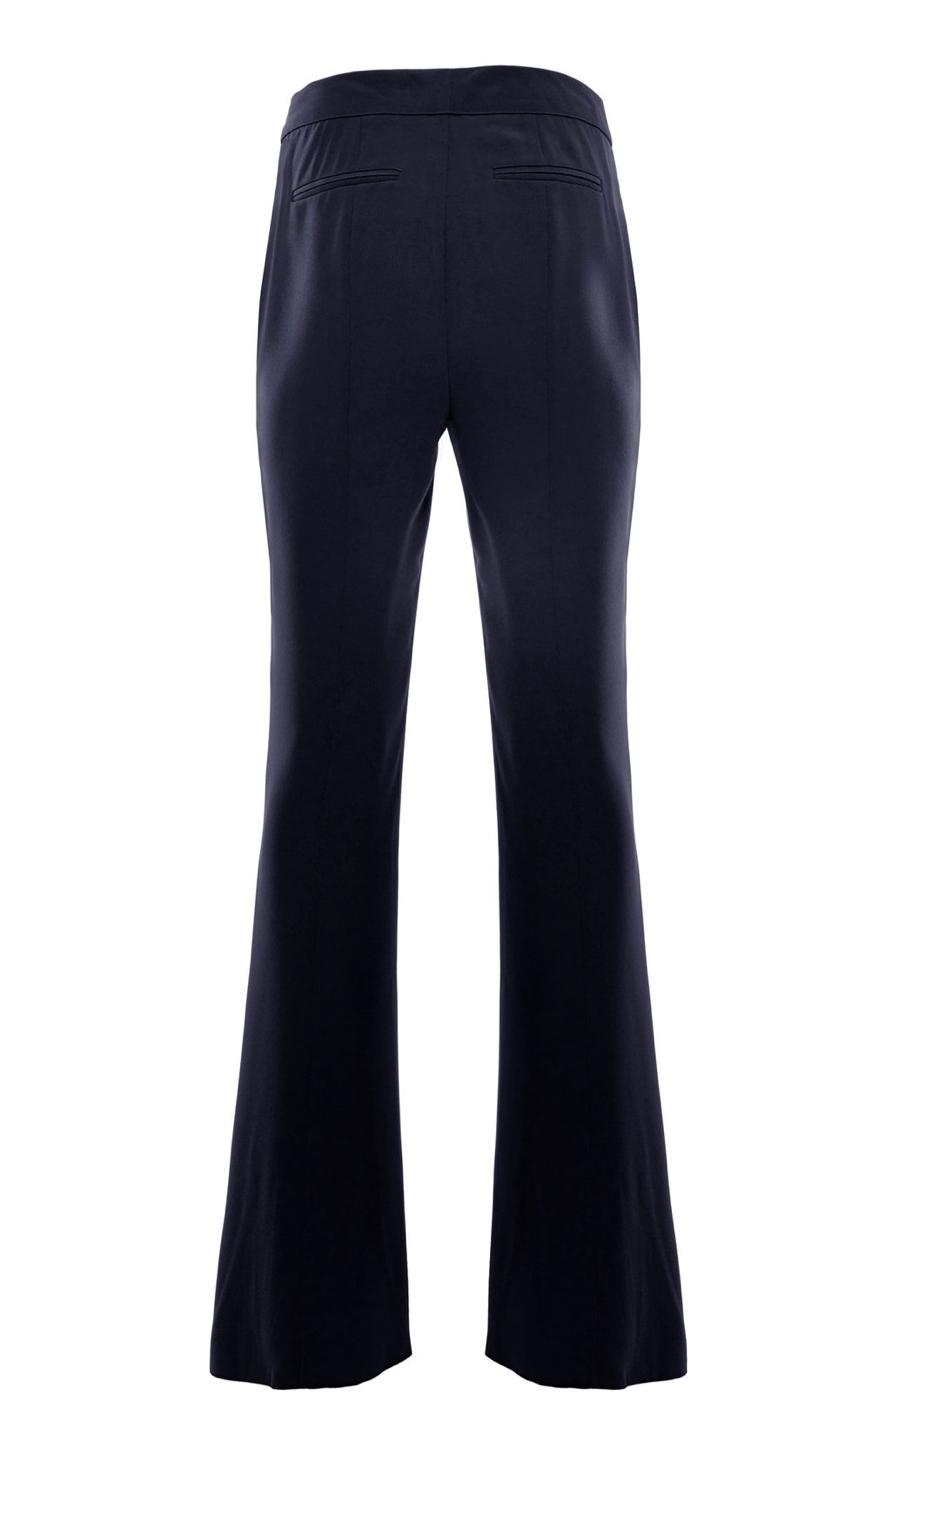 Pantalone Edoardo Nenette NENETTE | Pantalone | EDOARDO700